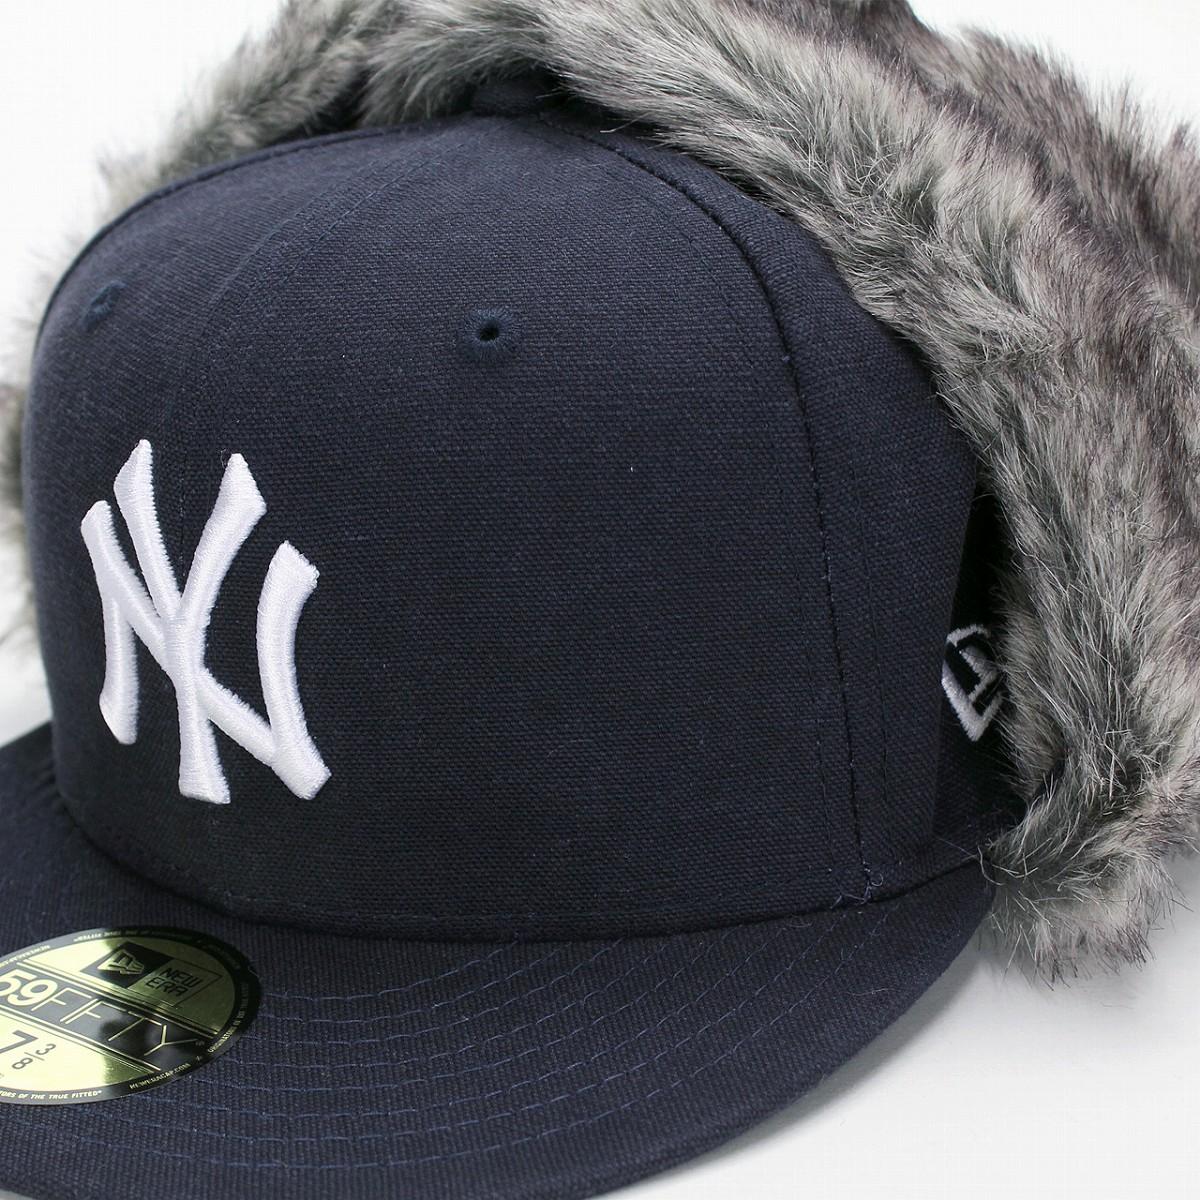 830e76935 NEWERA earflap New York Yankees 59FIFTY hat men fur winter men coordinates  street fashion baseball cap / dark blue navy [flying cap] present man new  ...